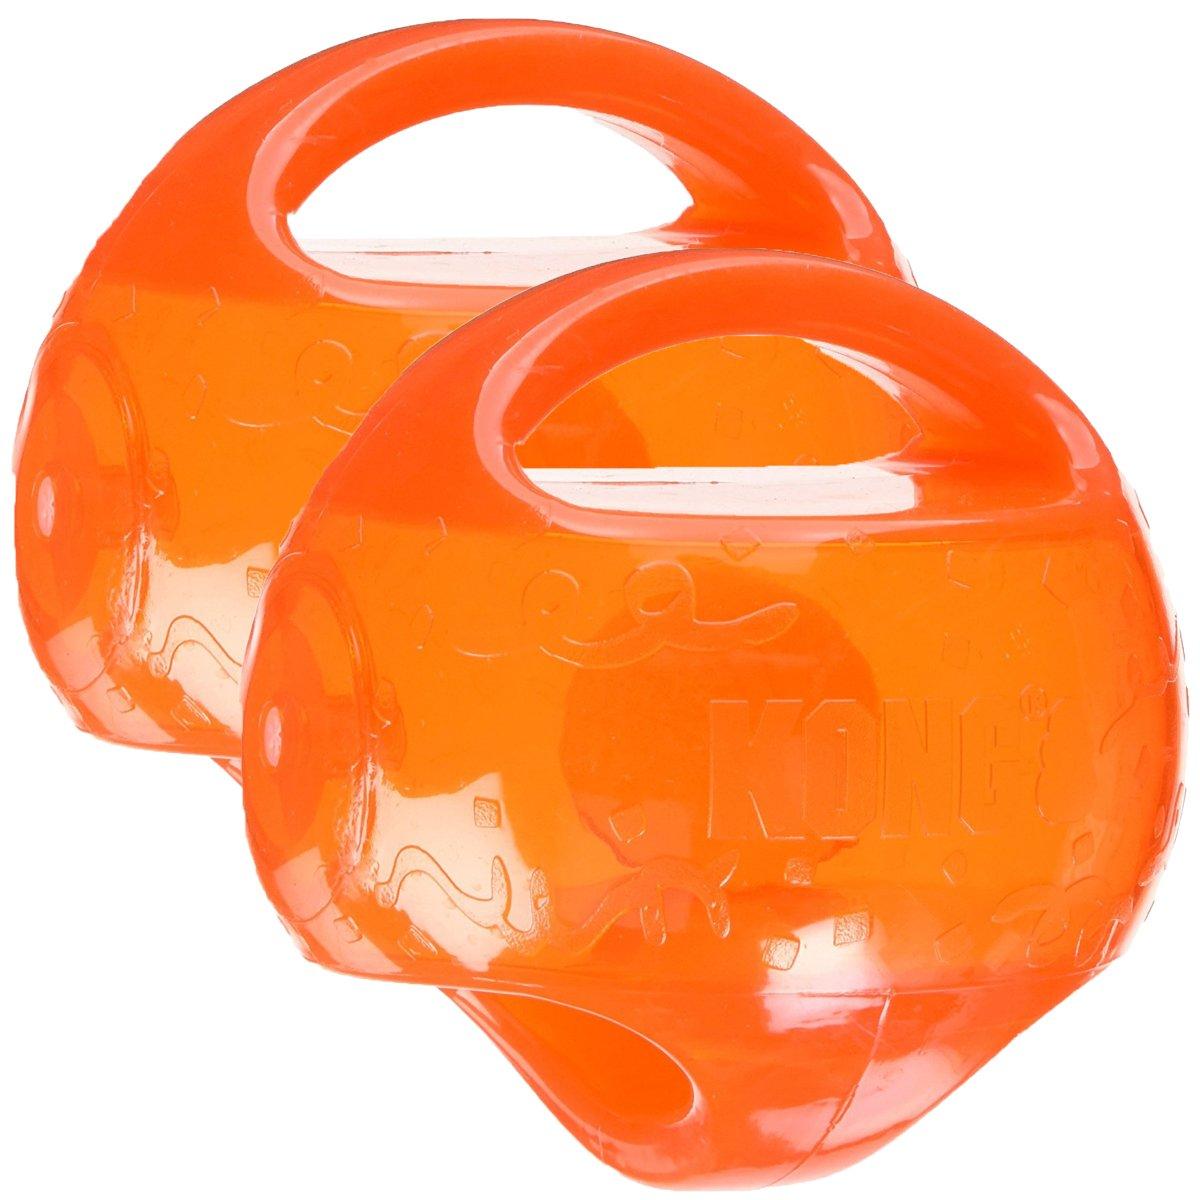 KONG Jumbler Ball Dog Toy, Medium Large (2 Pack)